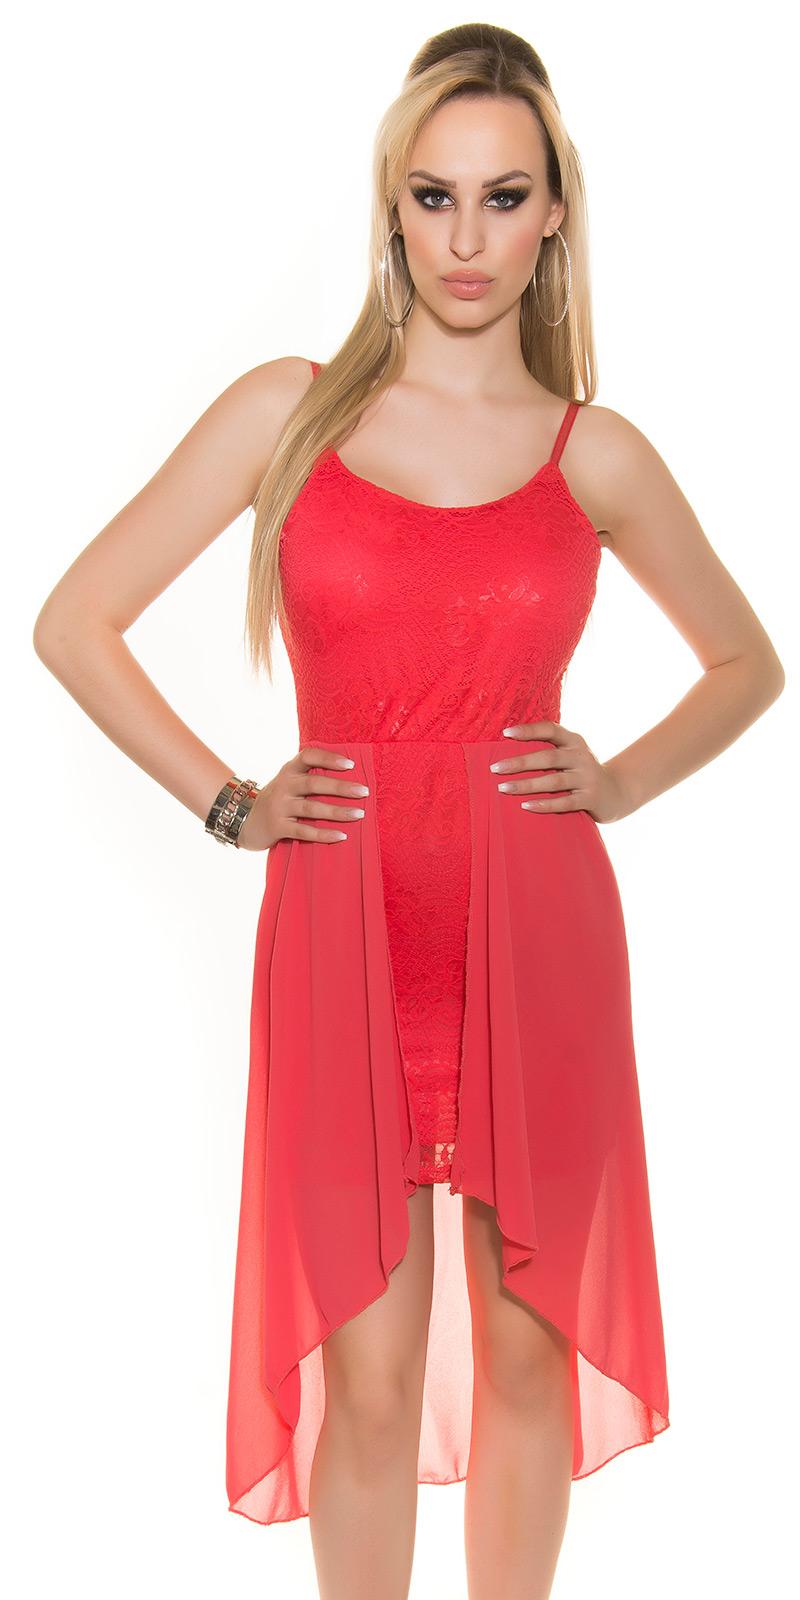 Koucla highlow kleid spitze chiffon abendkleid vokuhila minikleid hochzeit rot ebay - Vokuhila kleid chiffon ...